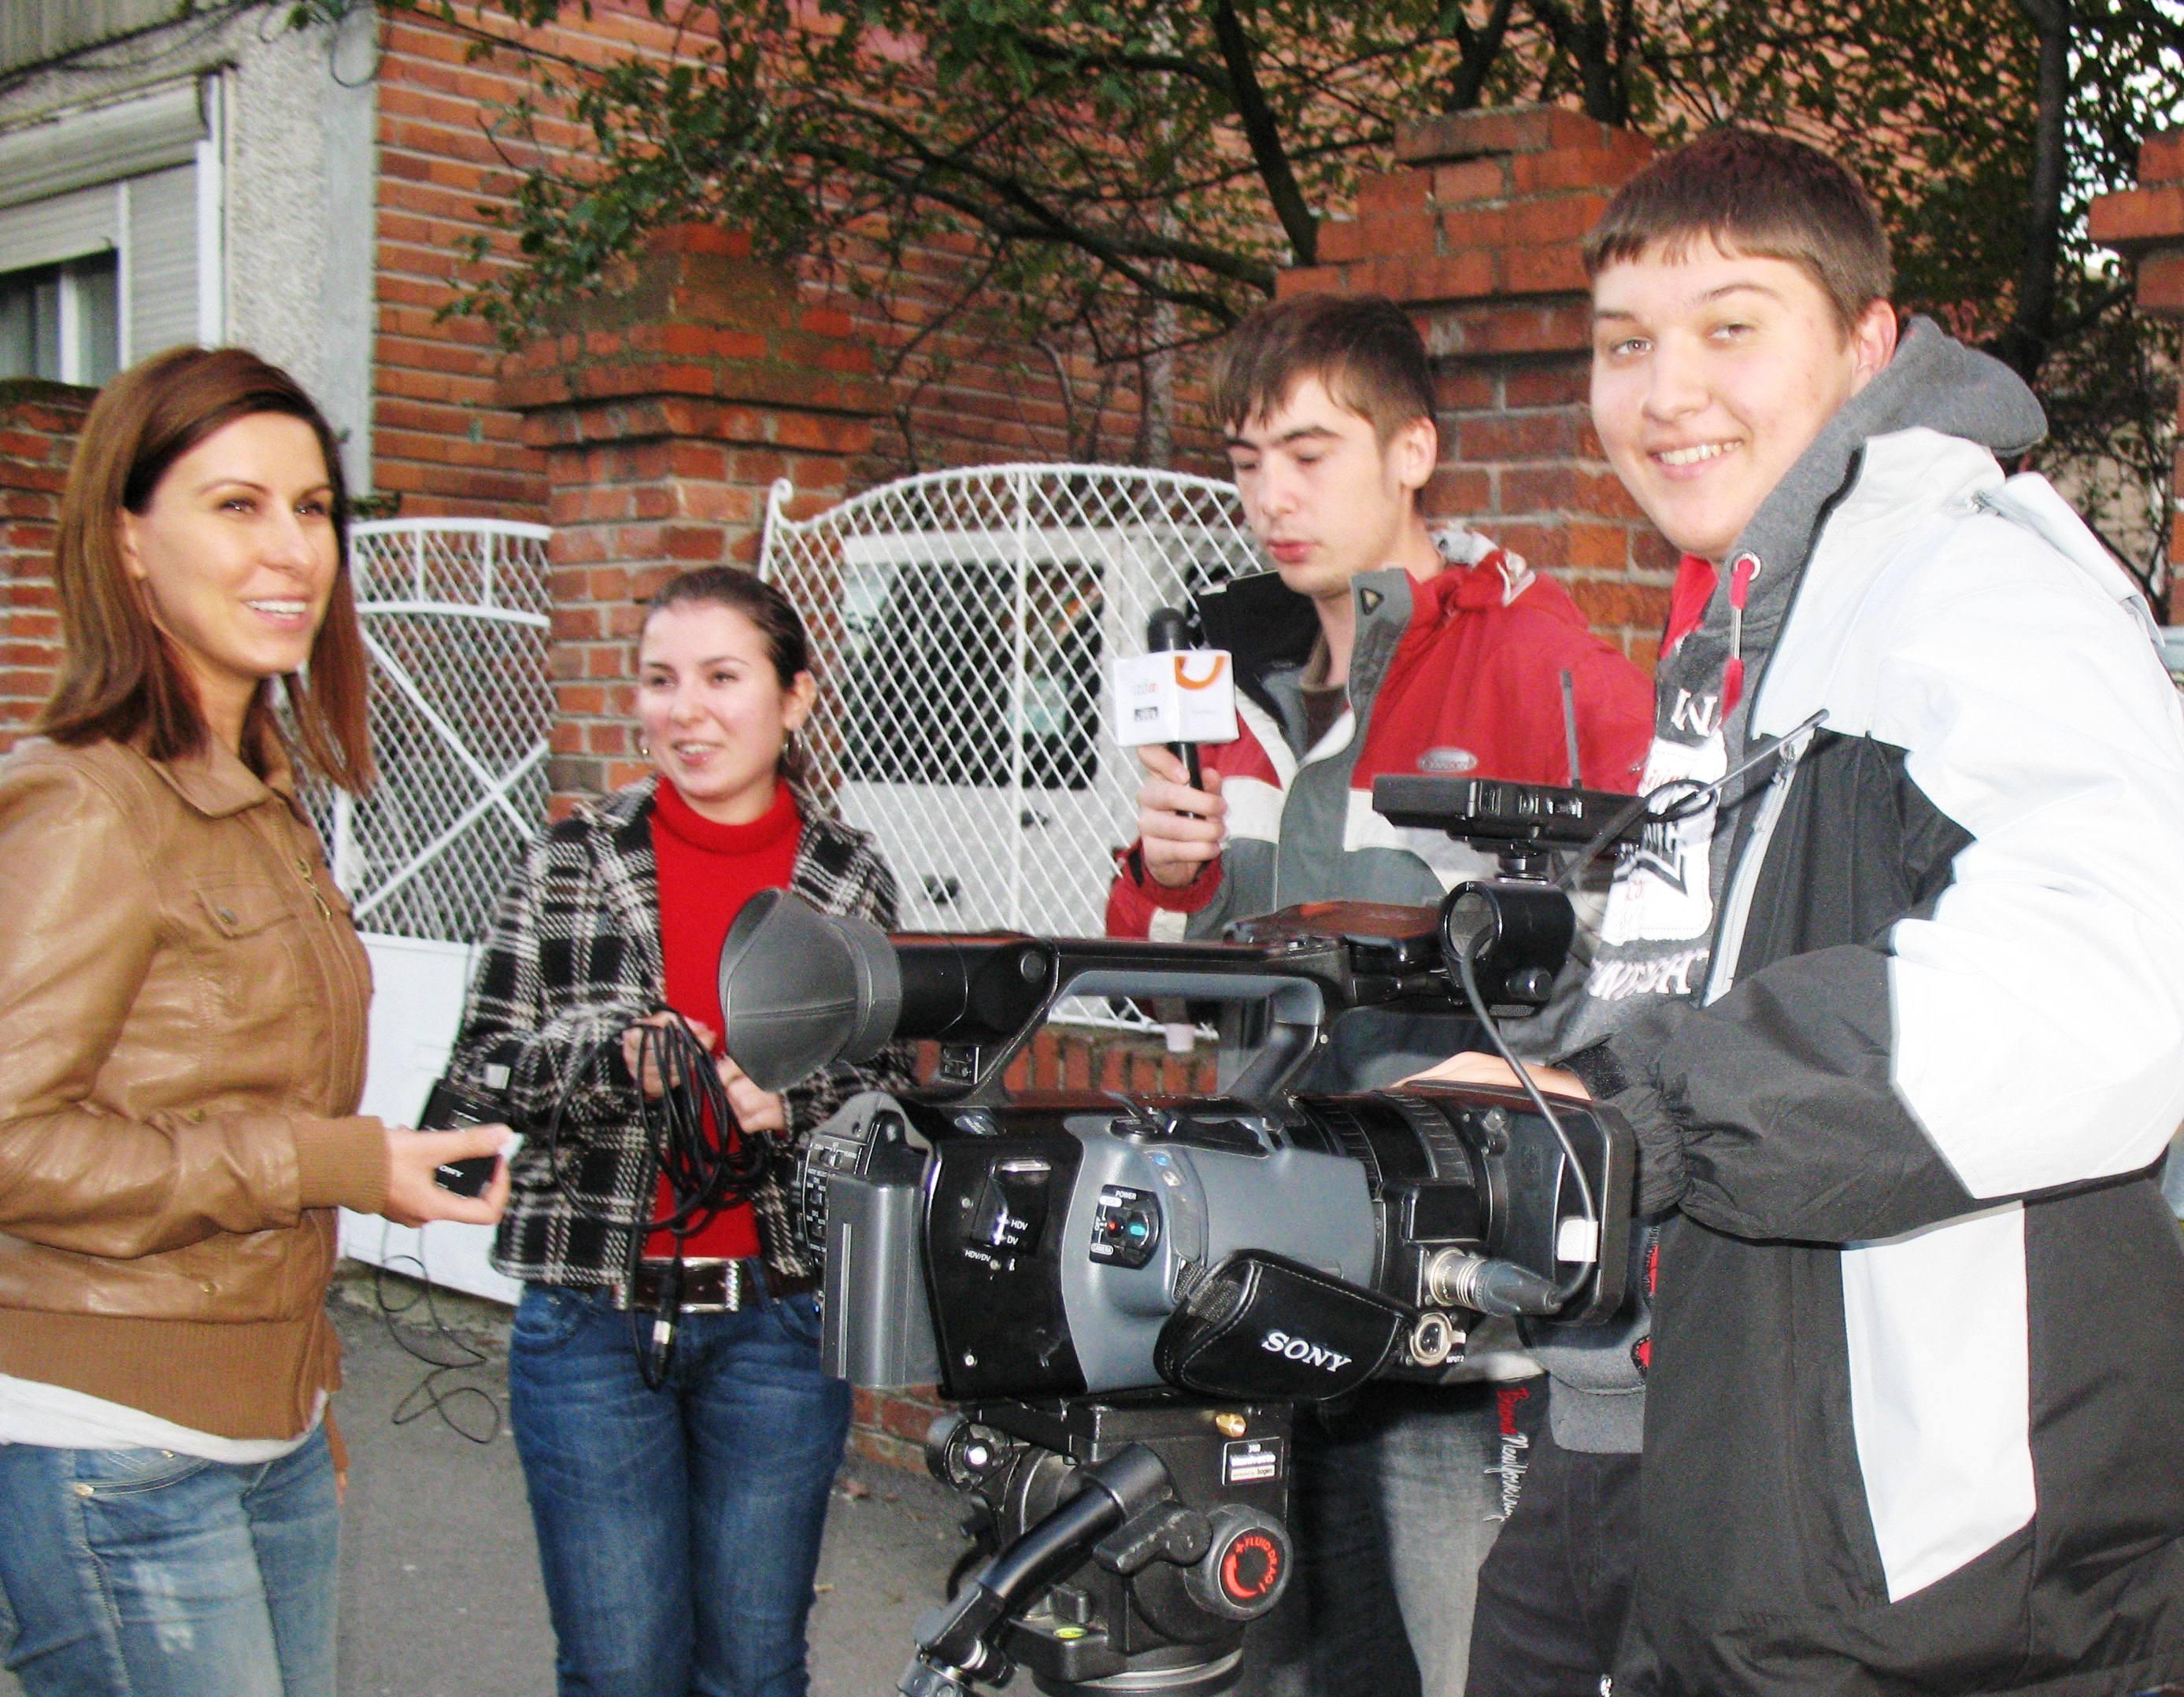 Media_project_22oct2010